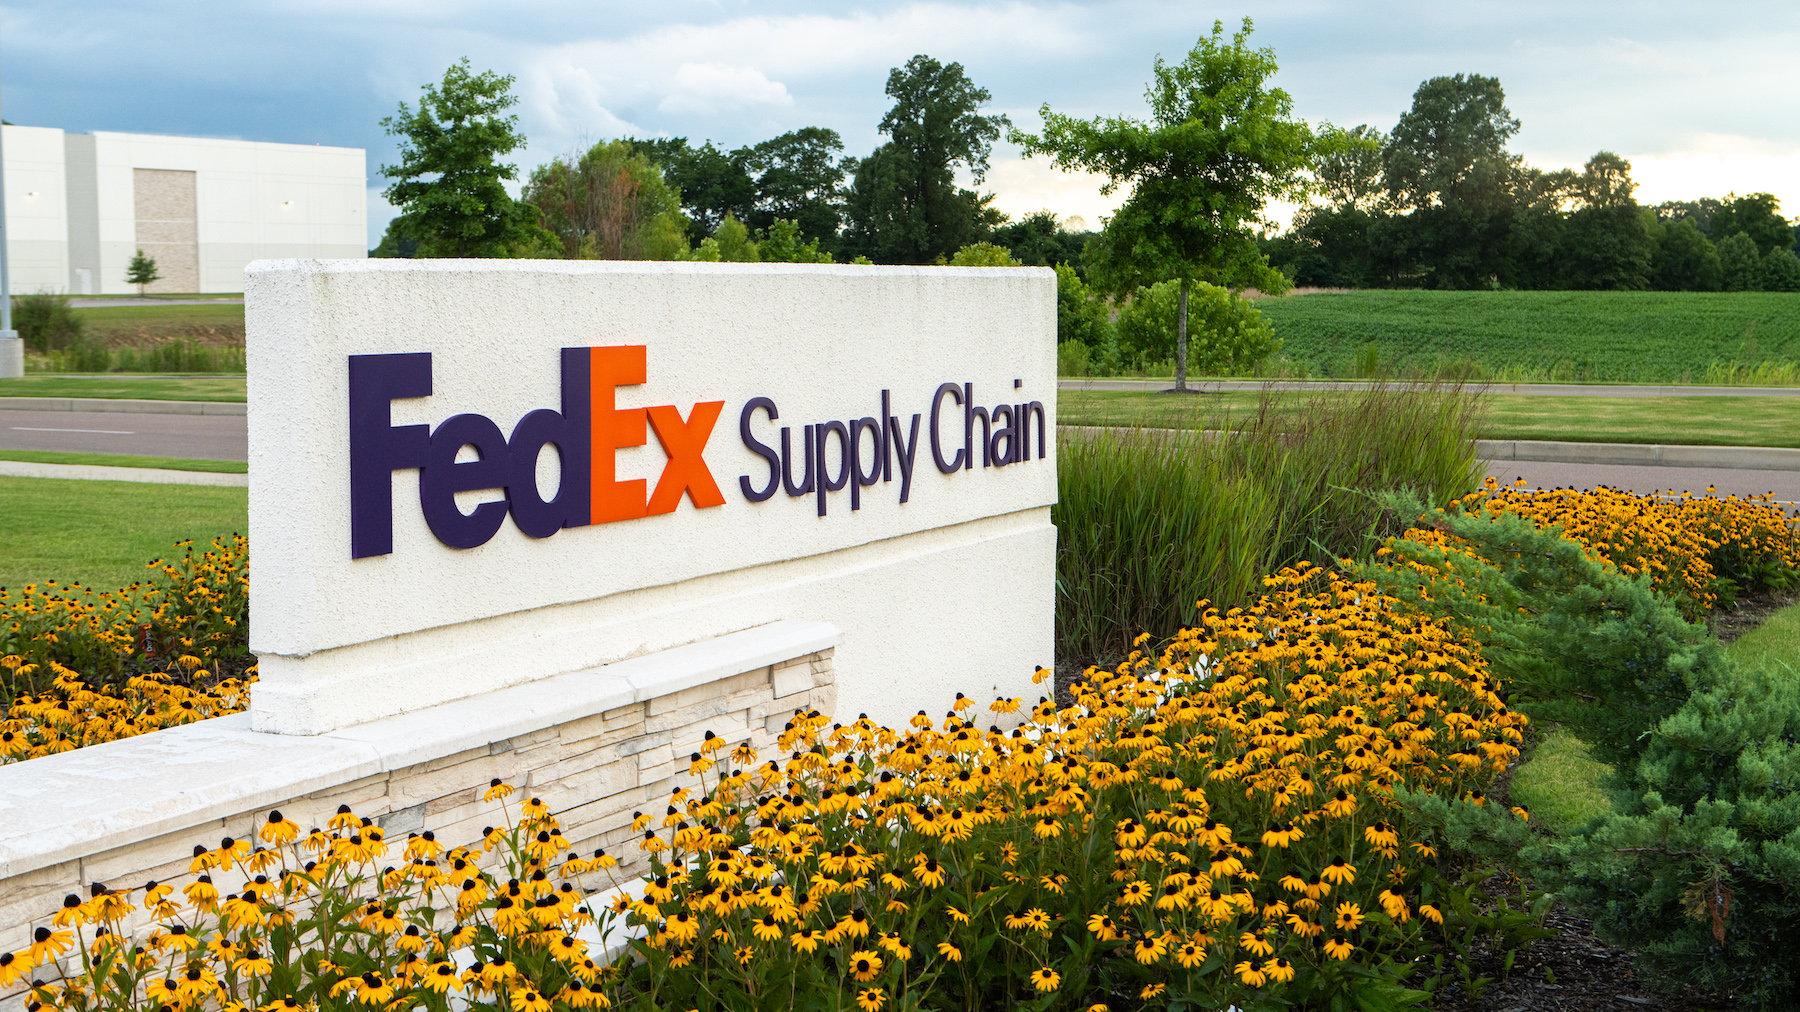 Legacy Park FedEx Warehouse sign and landscape